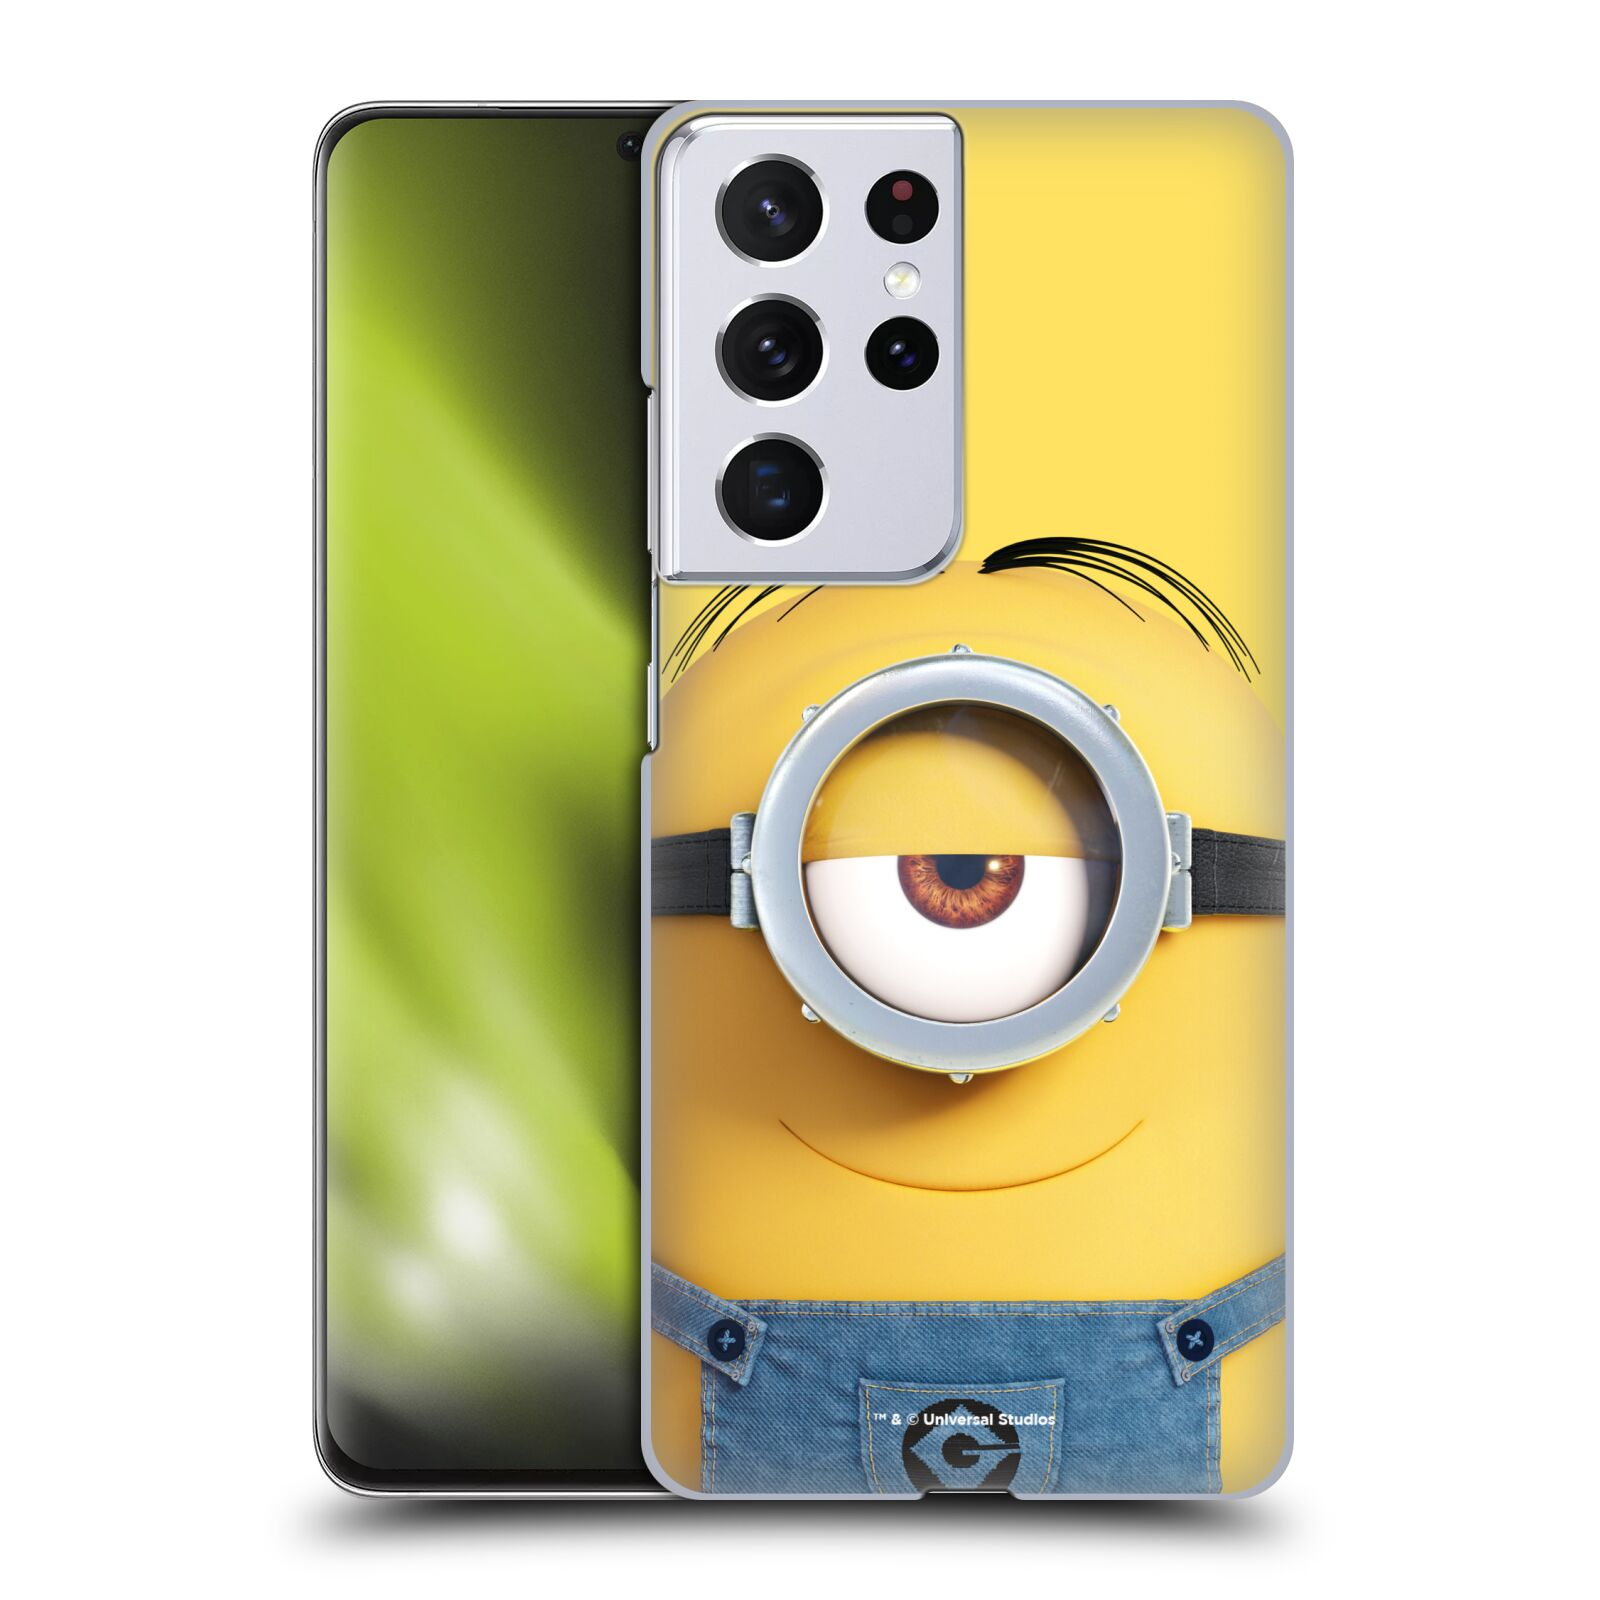 Plastové pouzdro na mobil Samsung Galaxy S21 Ultra 5G - Head Case - Mimoň Stuart z filmu Já, padouch - Despicable Me